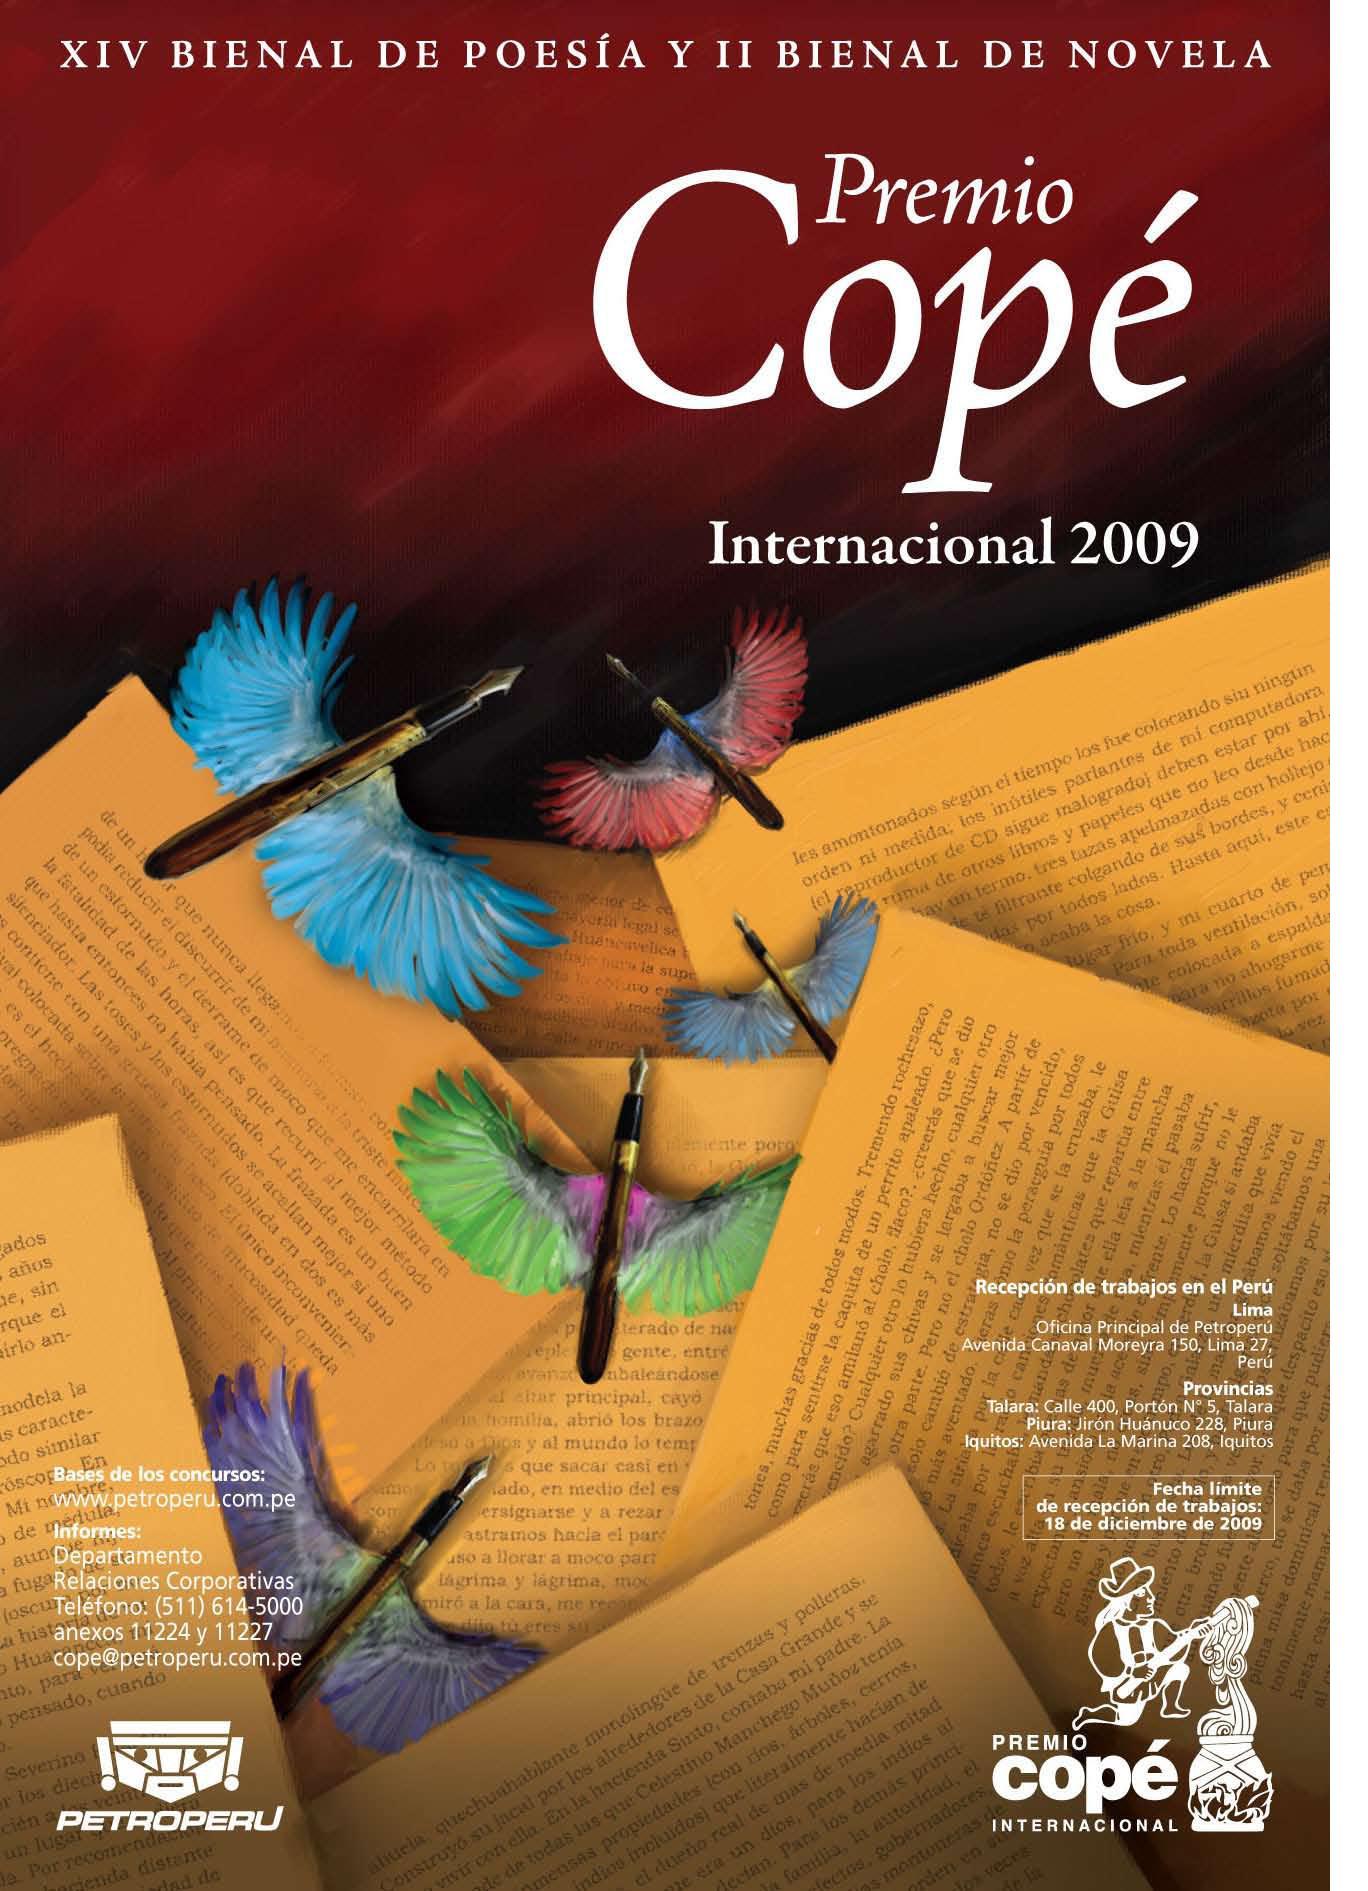 PREMIO COPÉ INTERNACIONAL 2009